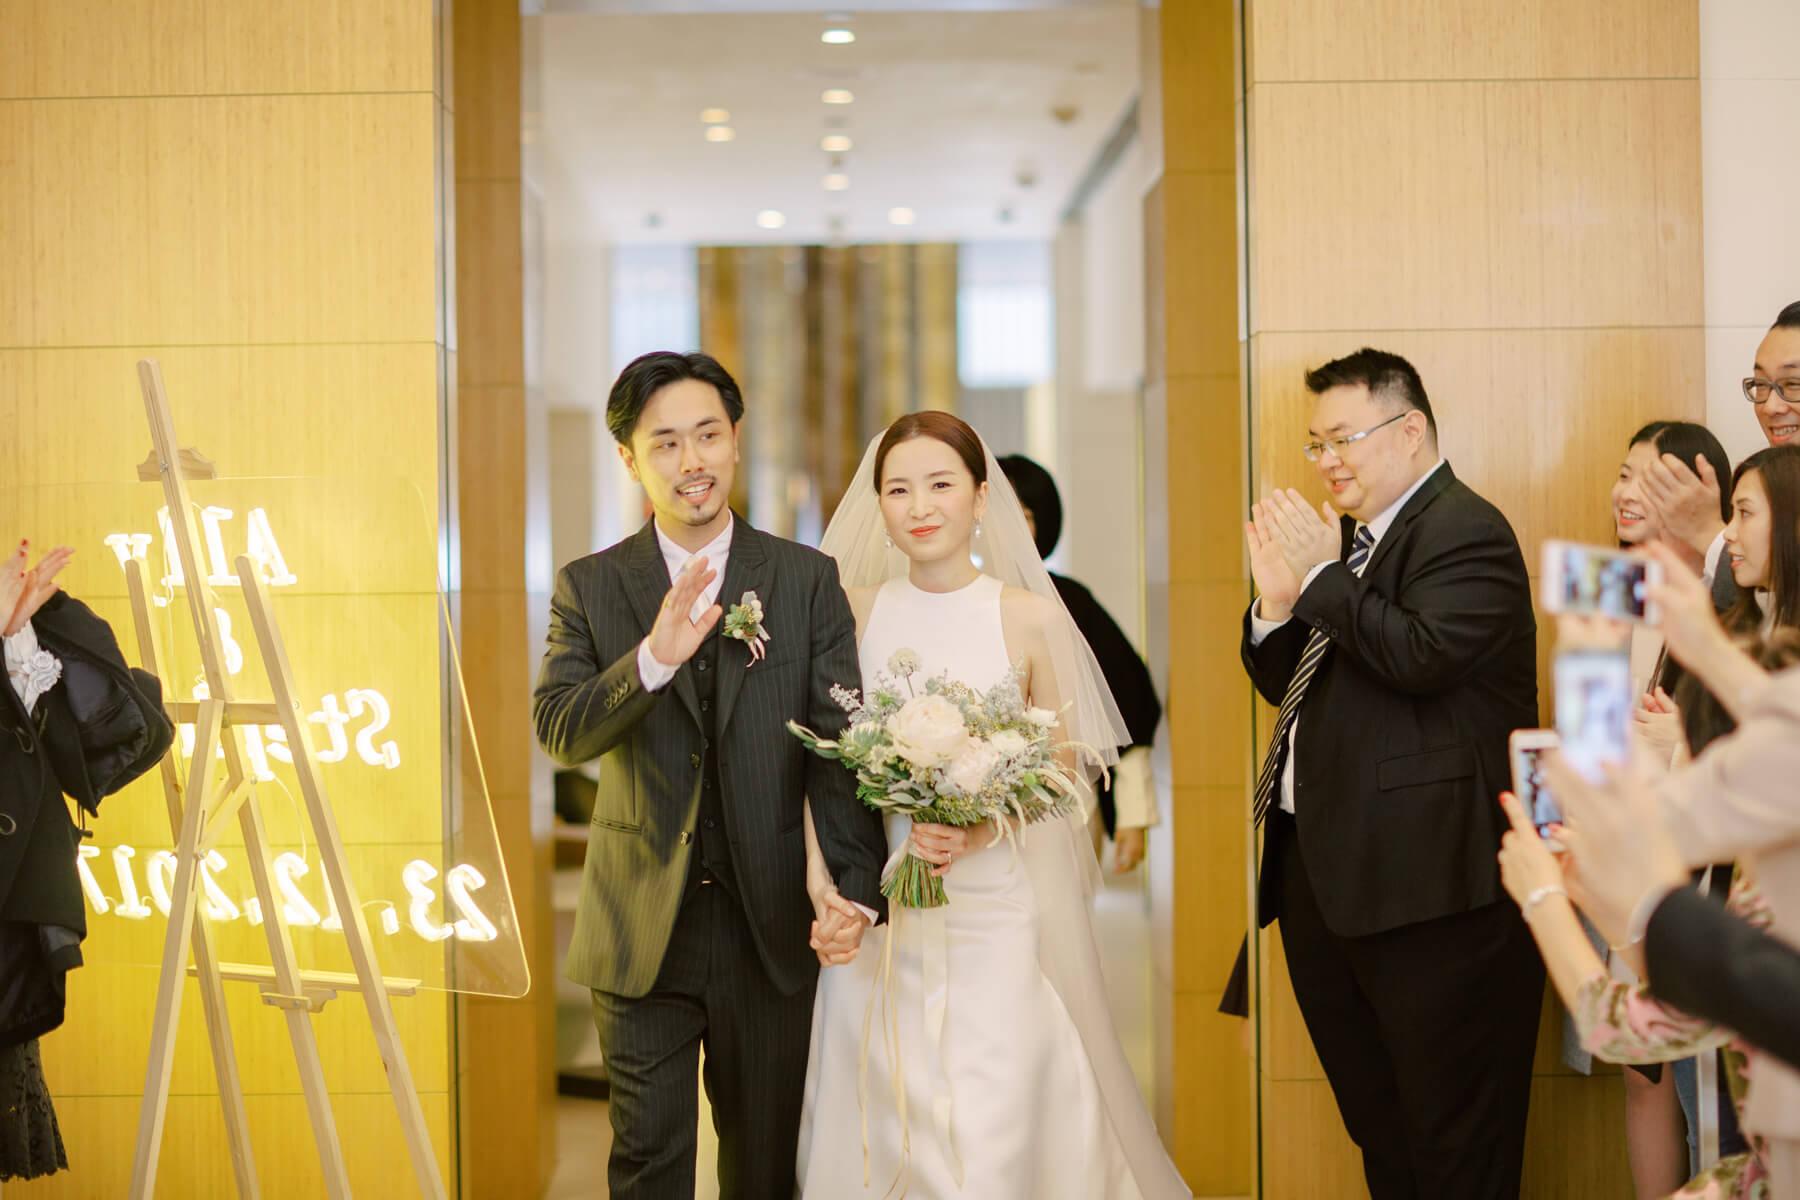 nikkiloveu-hongkong-weddingday-theupperhouse-as-017.jpg